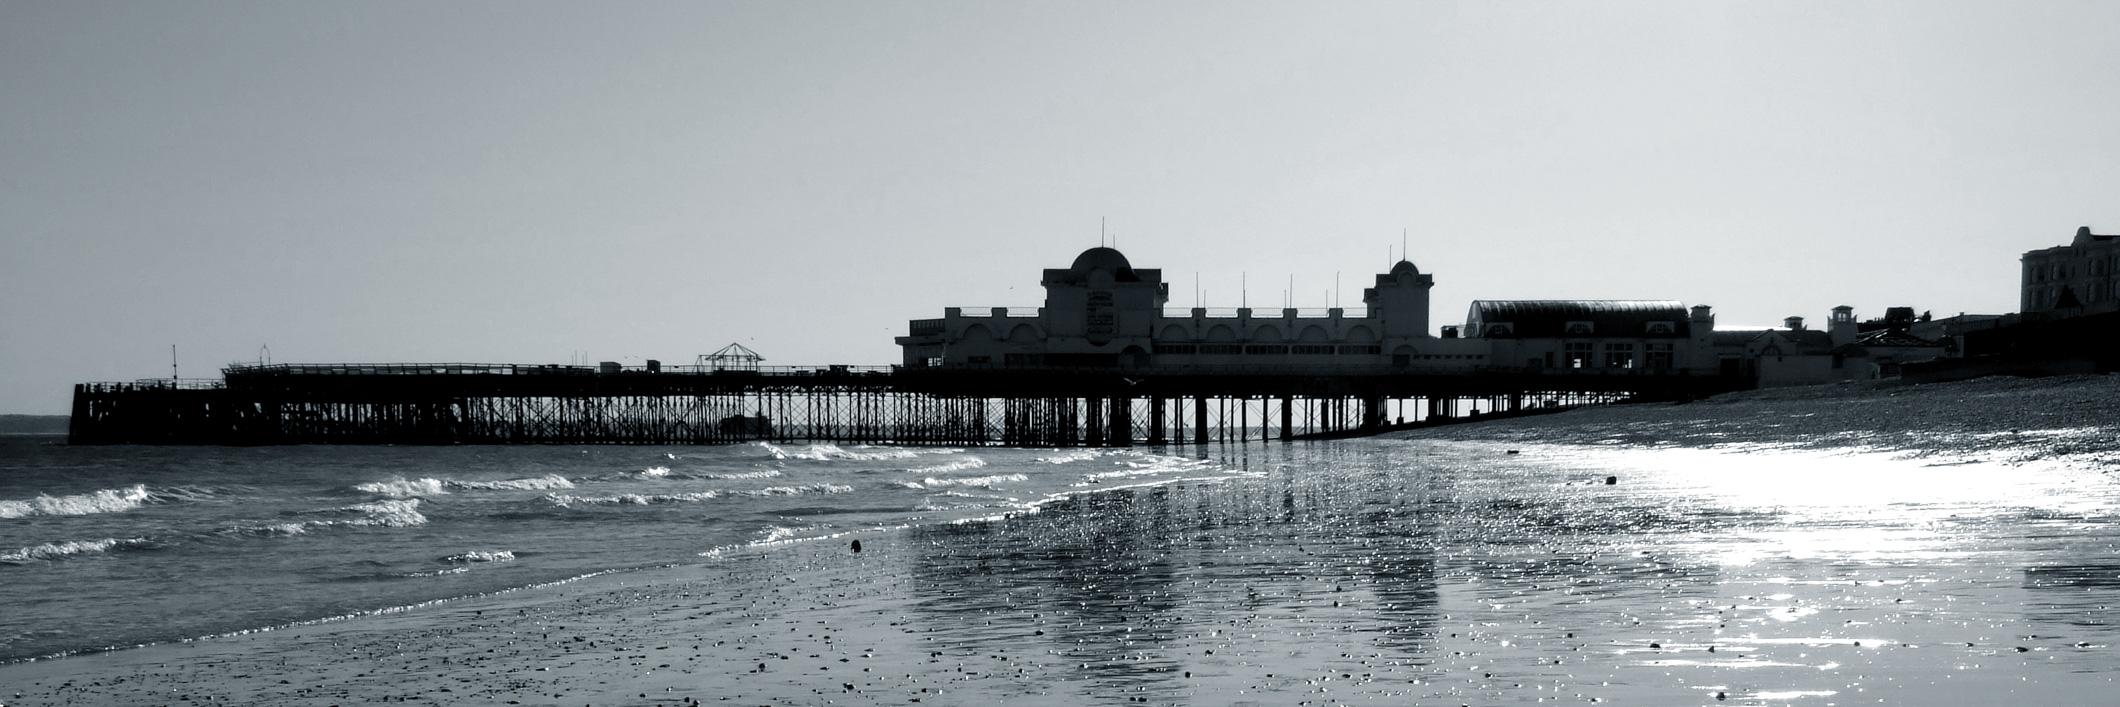 South Parade Pier - Black and White